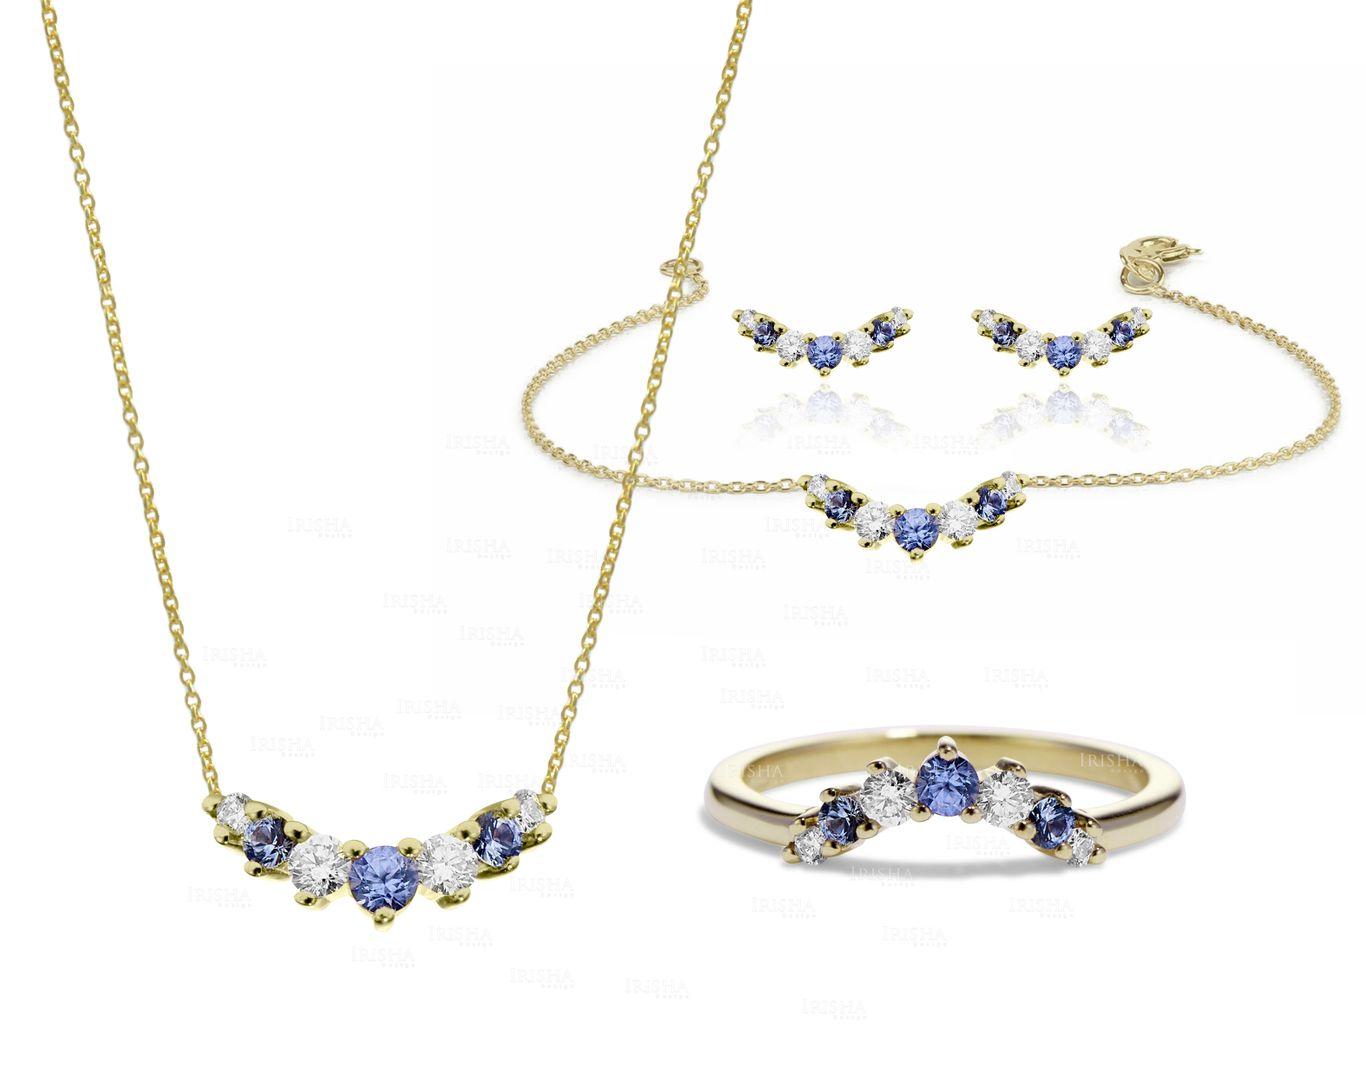 Genuine Diamond Blue Sapphire Curved Ring Earring Bracelet Necklace 14K Gold Set